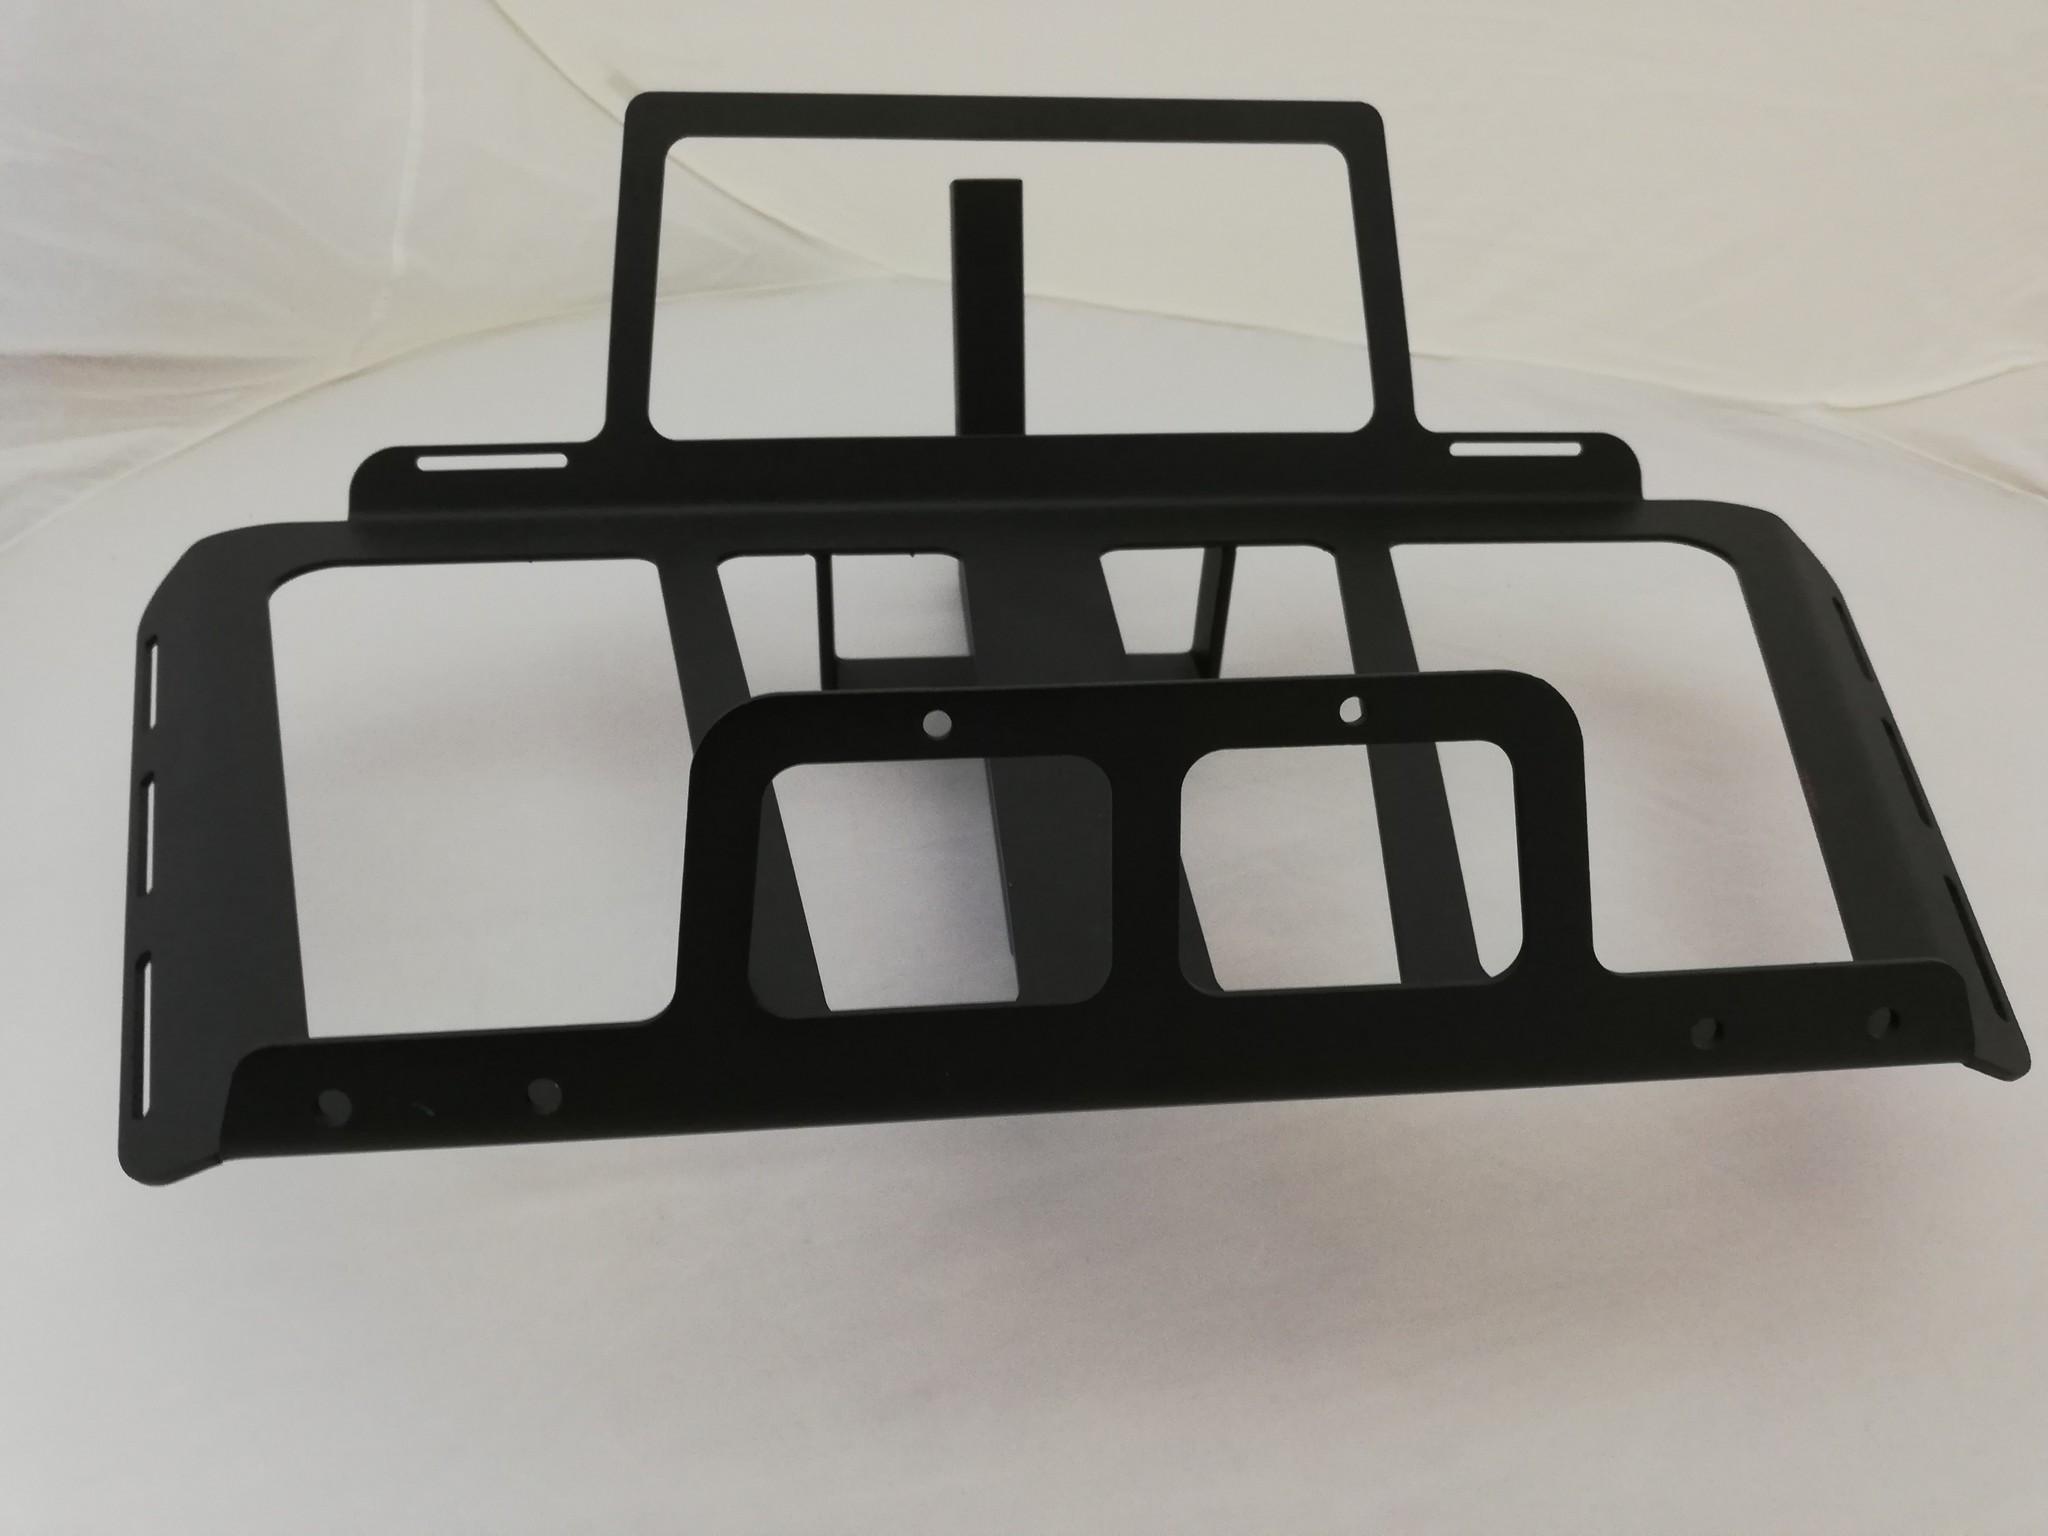 JVR Products Slide-in-Träger GL 1800 model 2018 mattschwarz